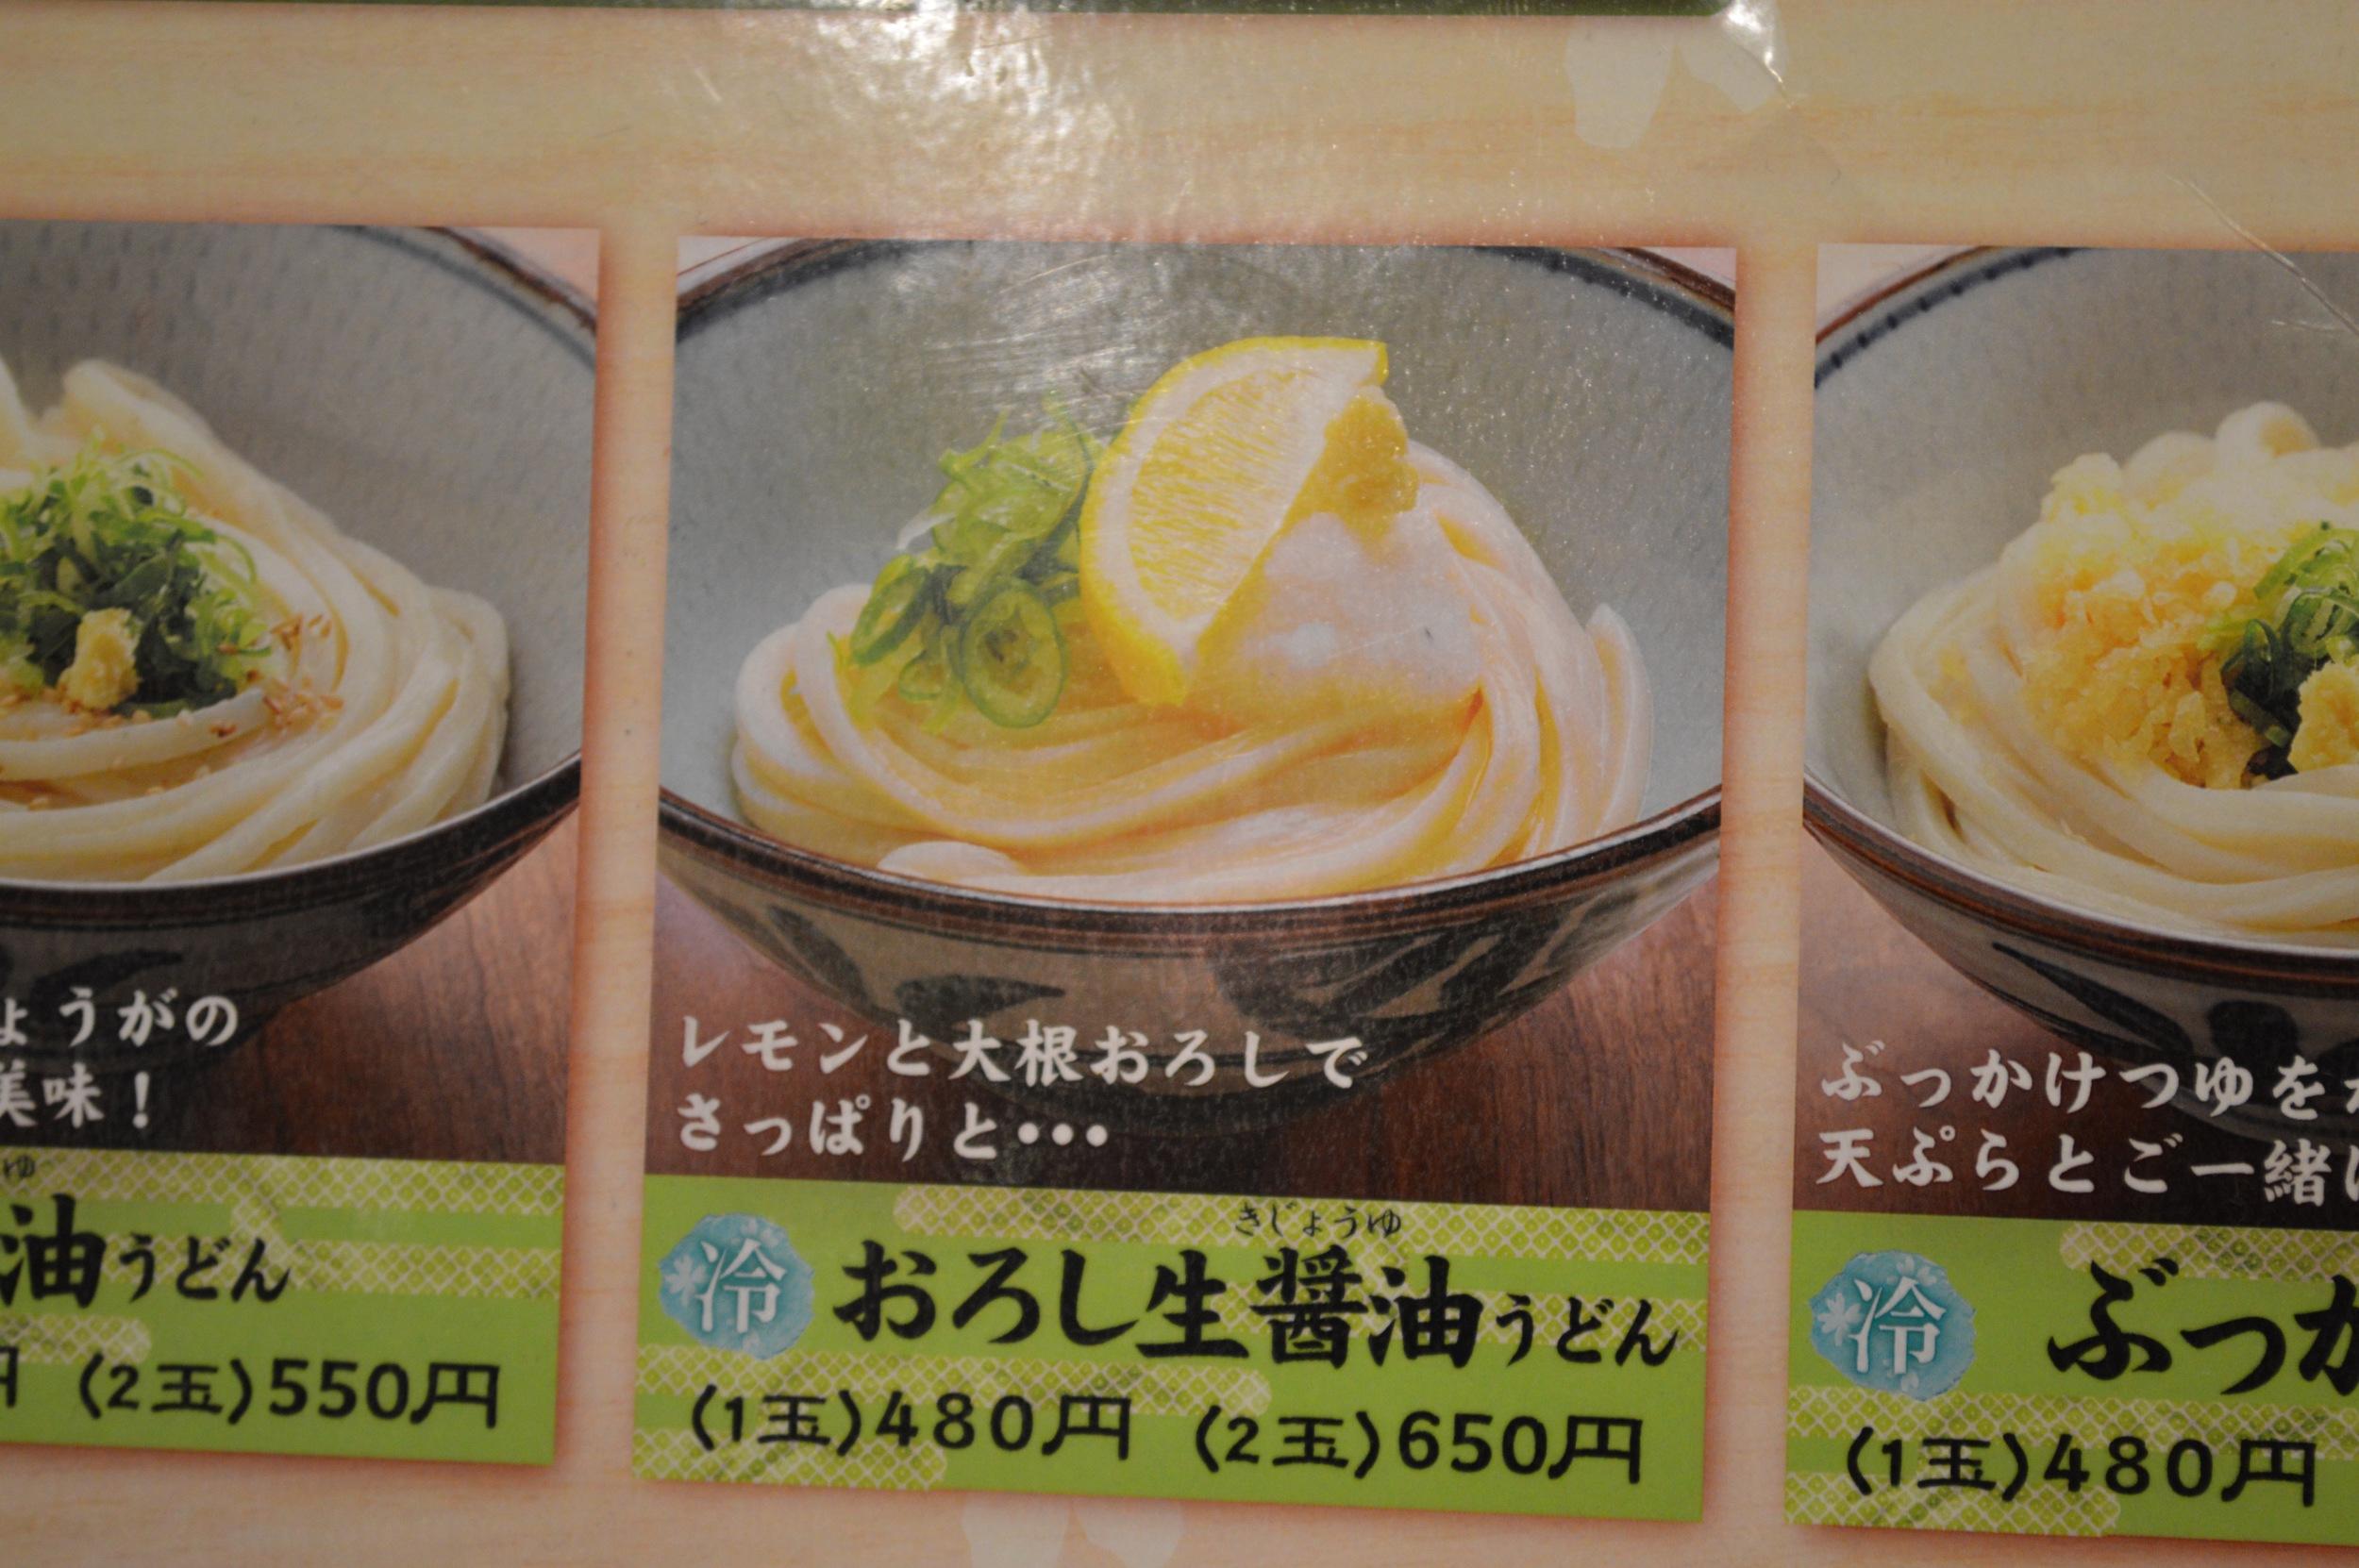 Oroshi Kijyouyu Udon for 480 yen (Normal), 650 yen (Large)